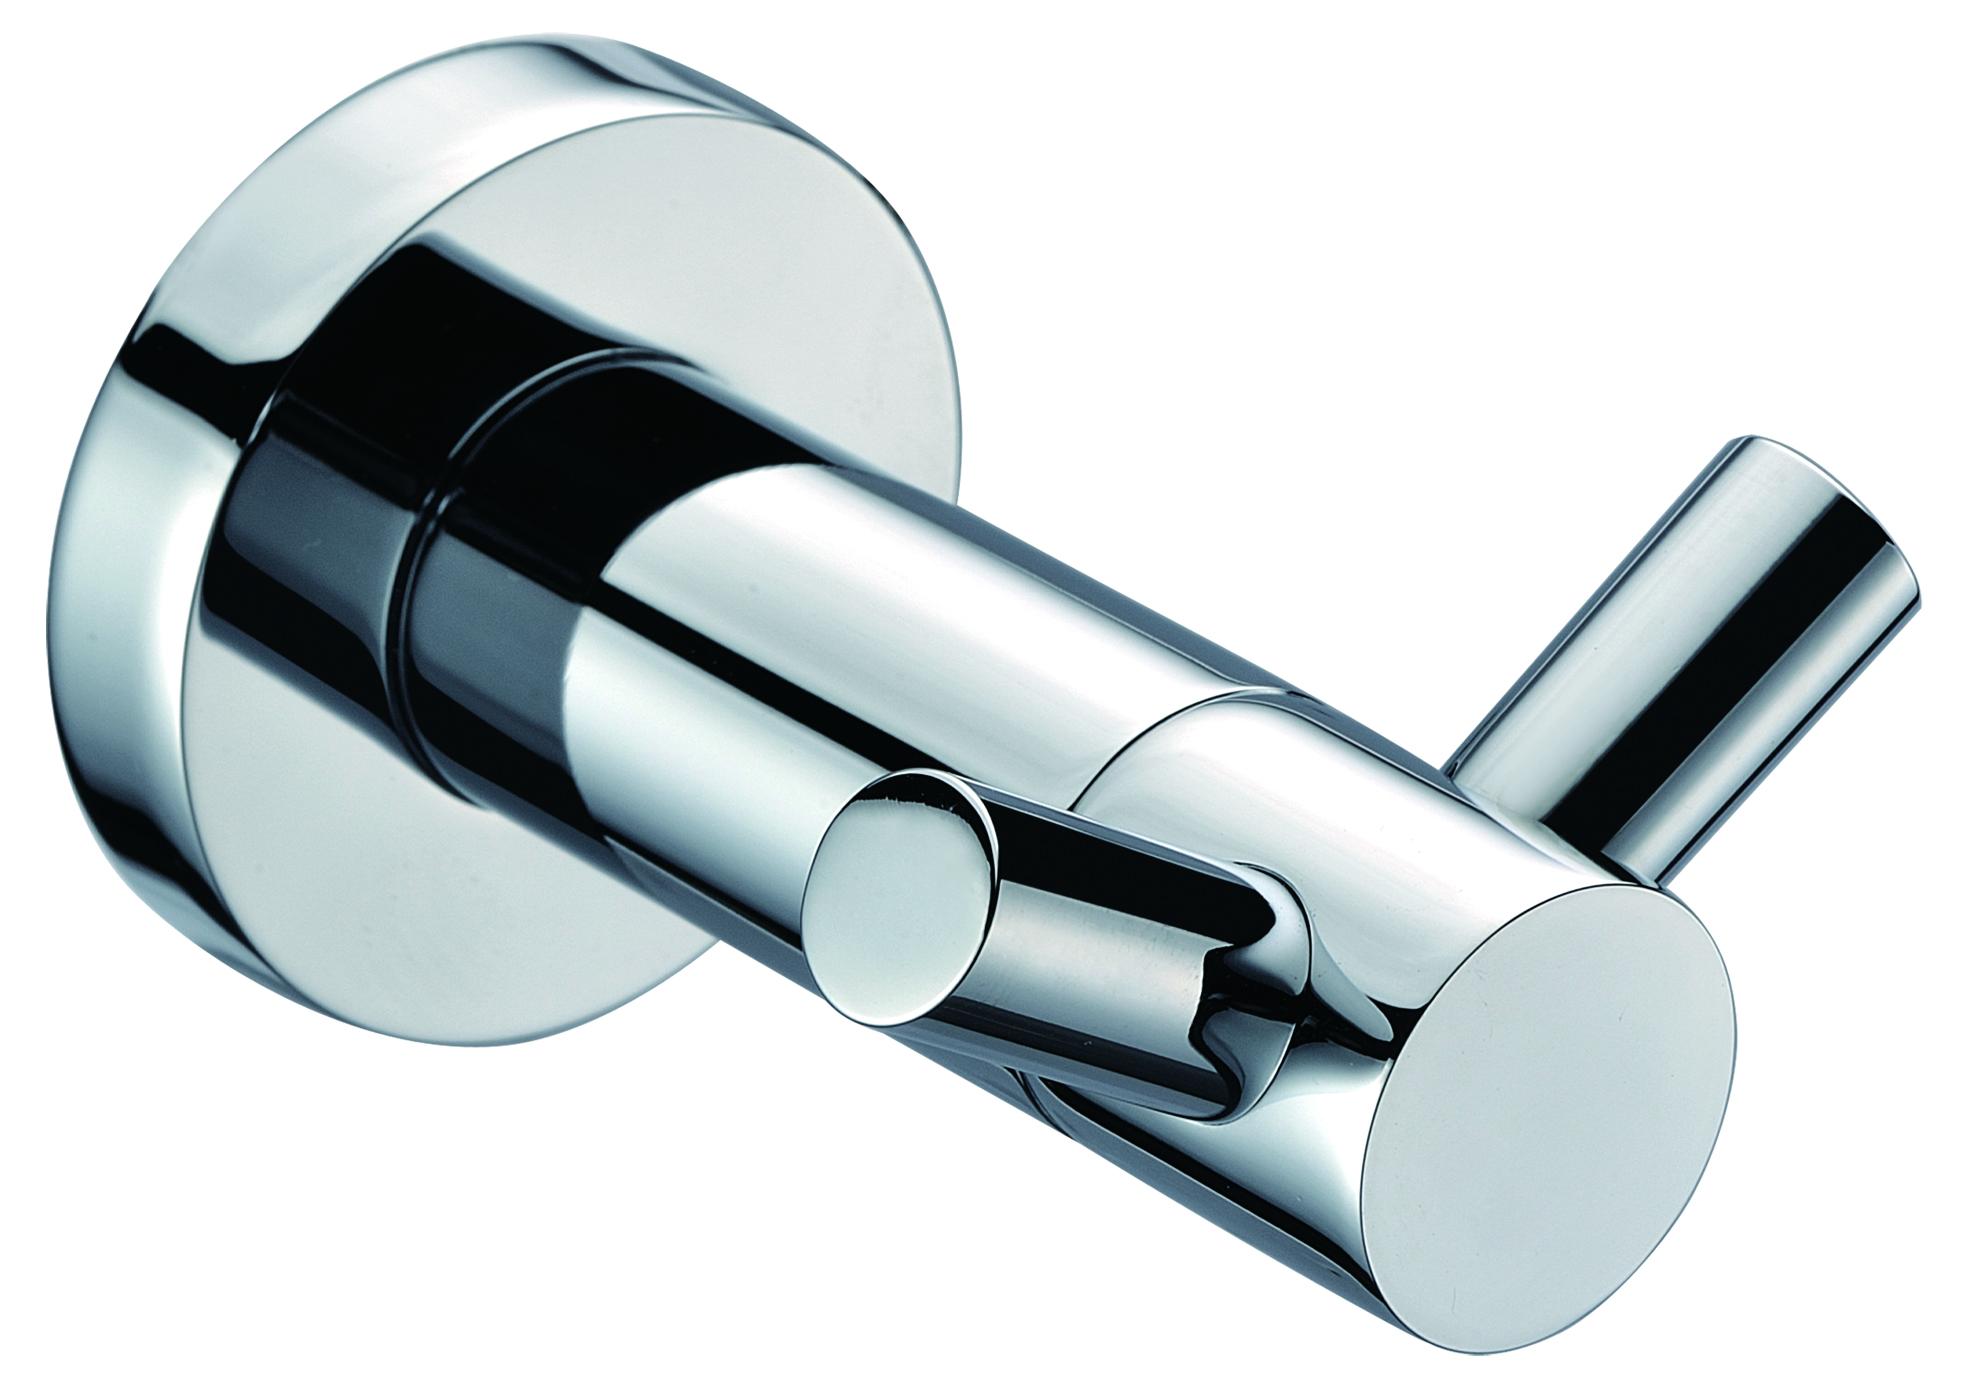 Decorative Solid Brass Hardware House Bathroom Accessories Robe Hook